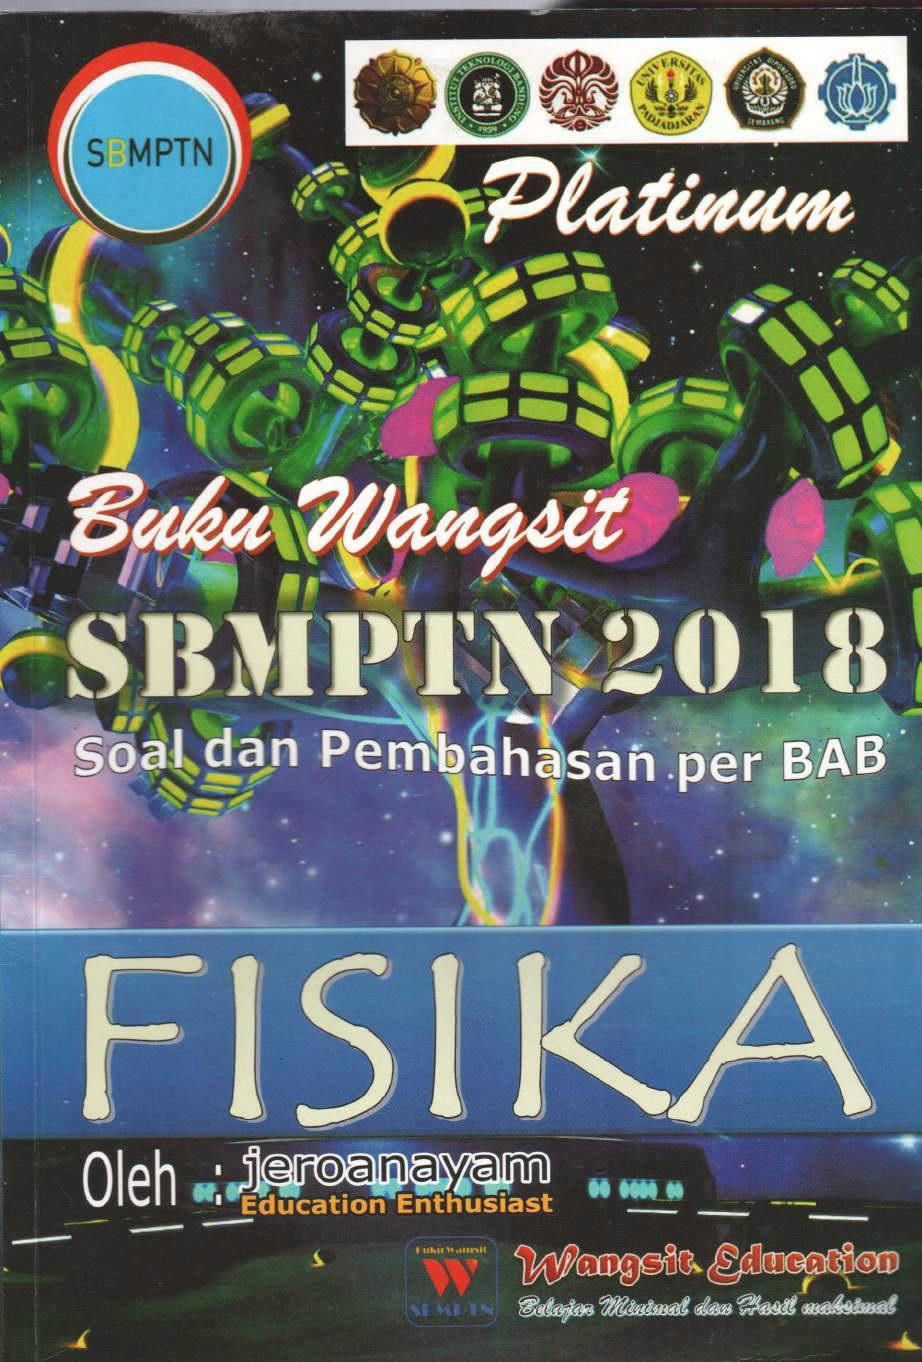 Buku Wangsit SBMPTN 2018 Fisika (Soal dan Pembahasan per BAB)